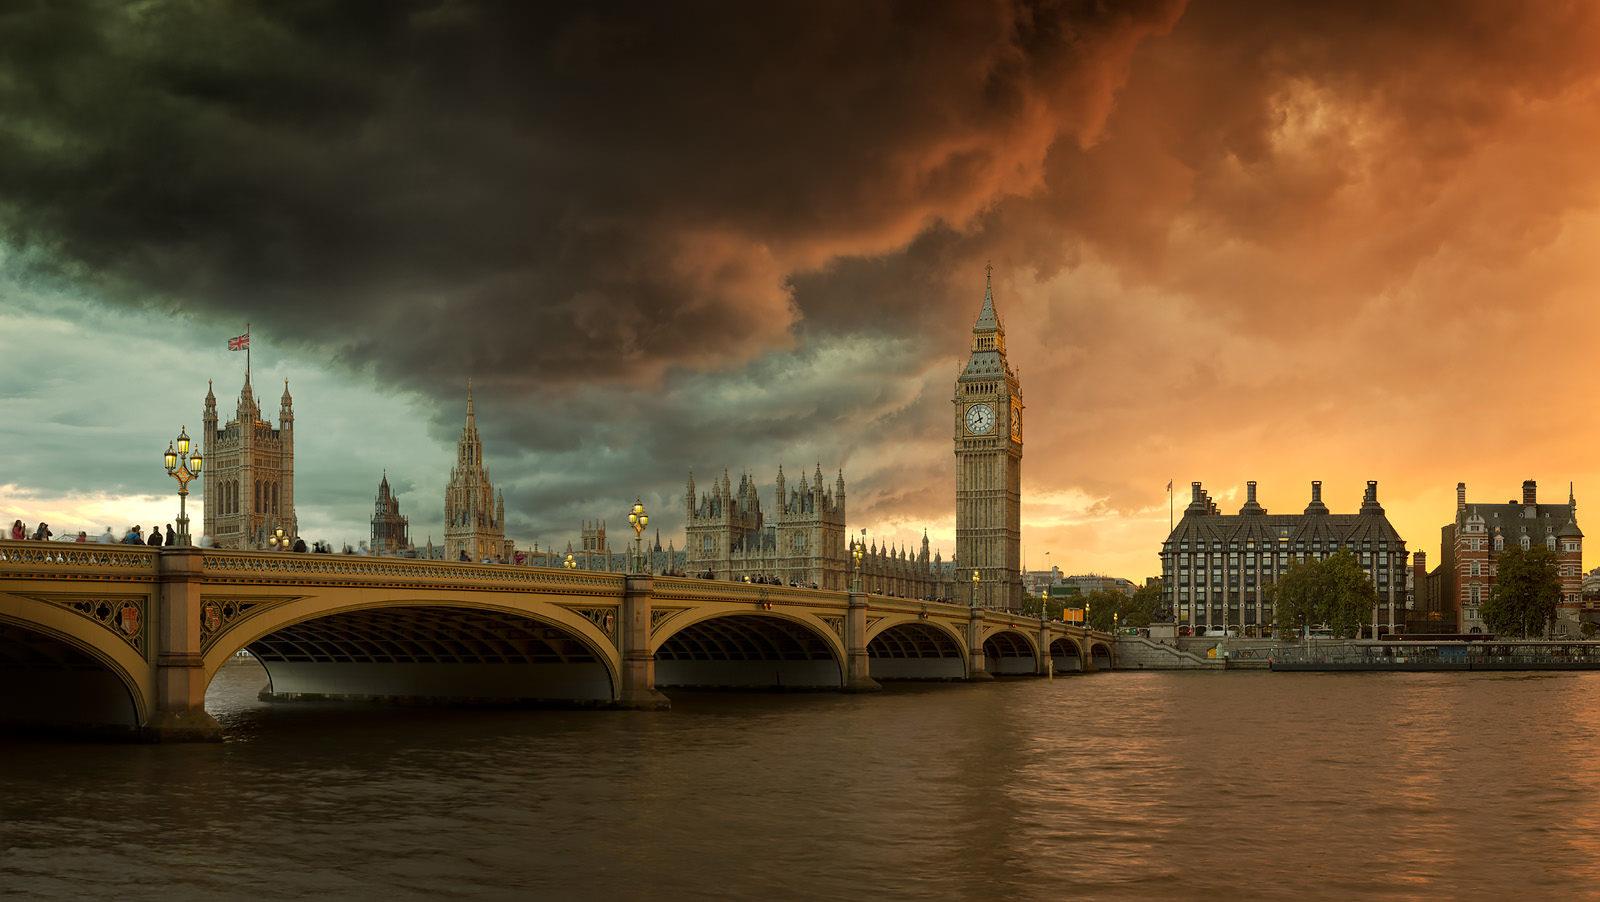 Palace of Westminster Acrylic - London Fine Art Photo